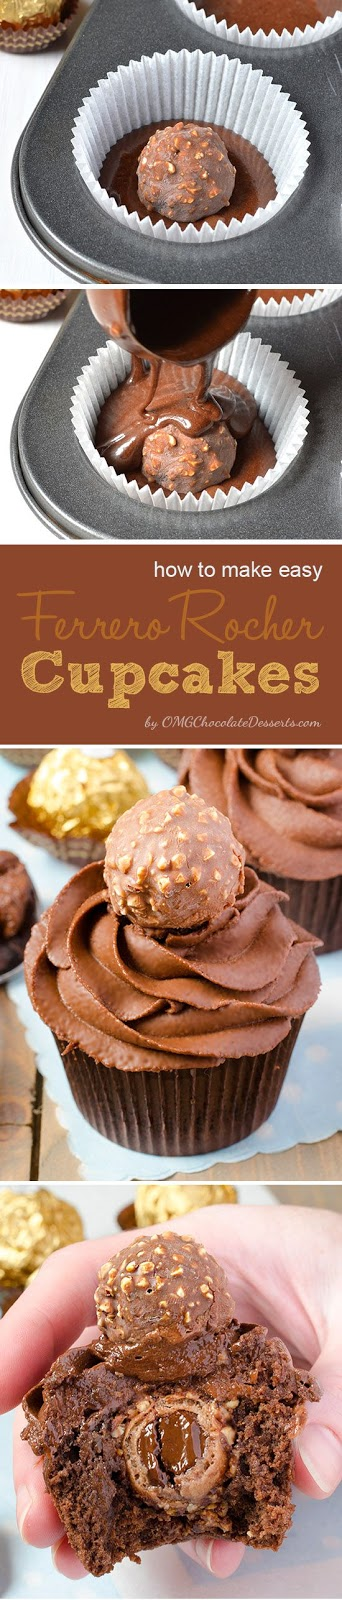 The Best Ferrero Rocher Cupcakes